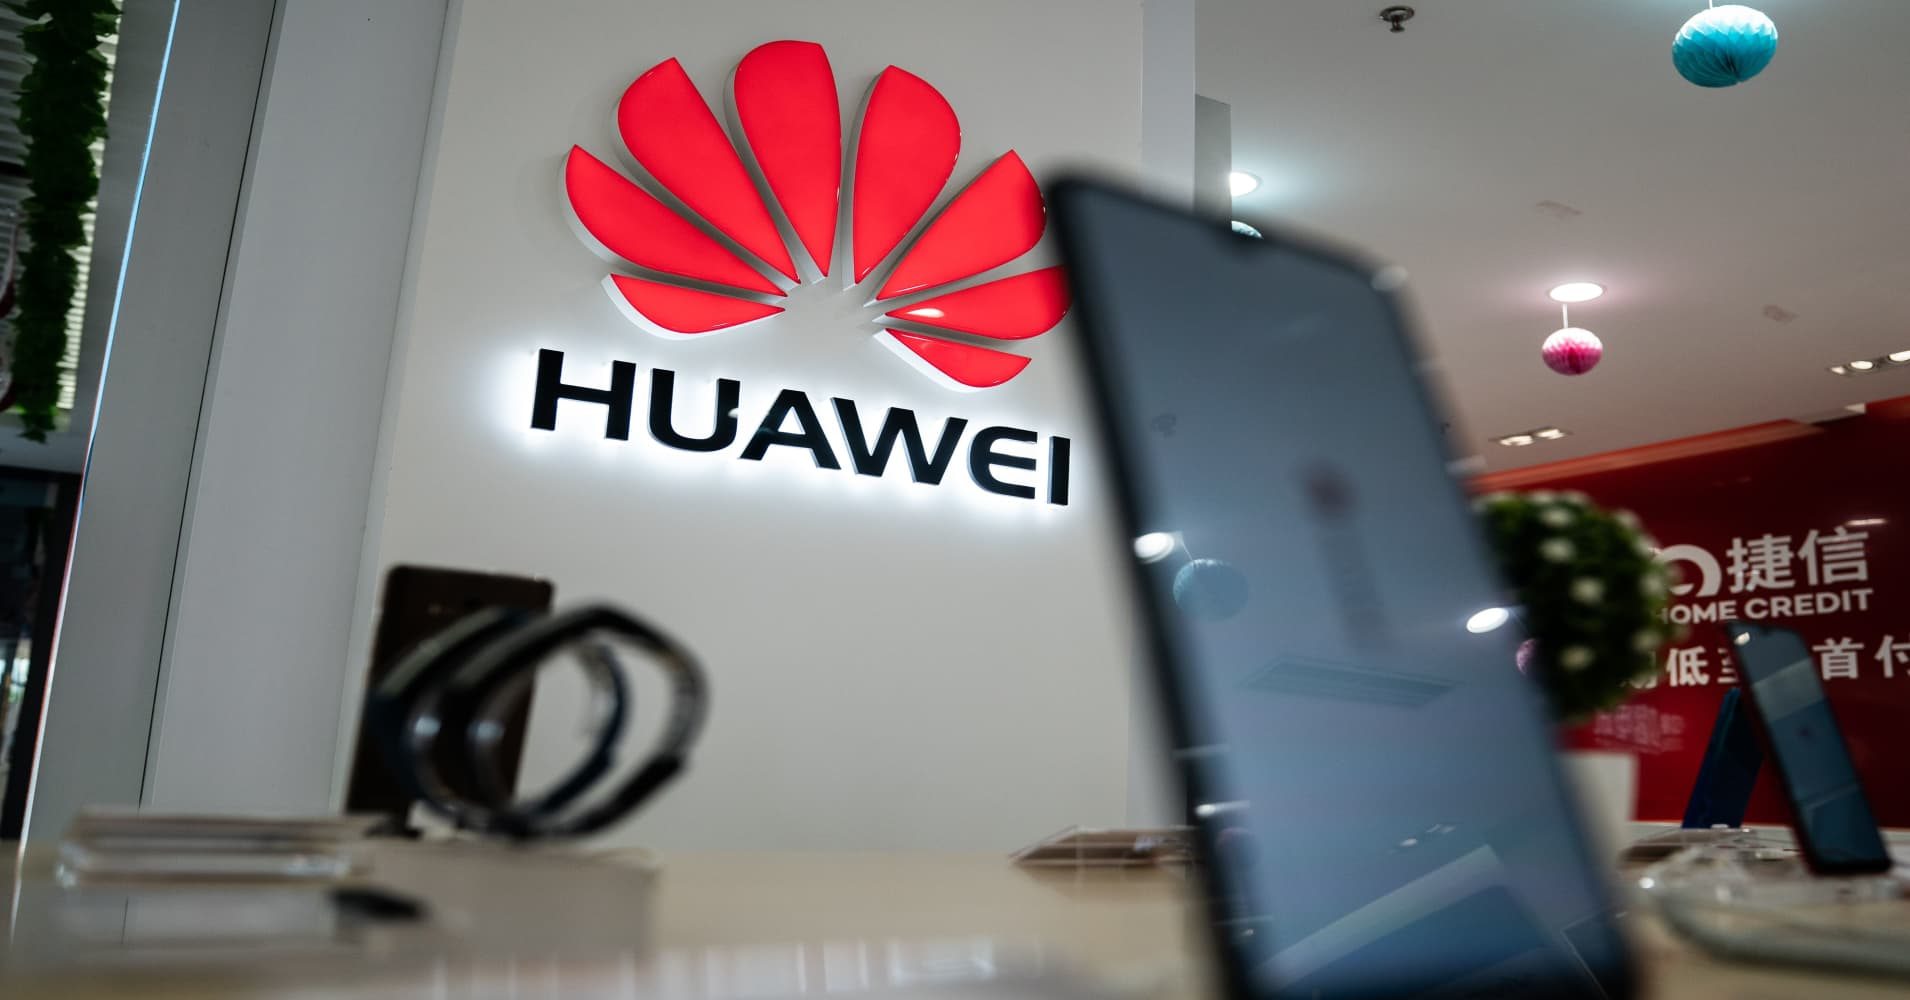 Vi sao Trump kho long noi long lenh cam Huawei?